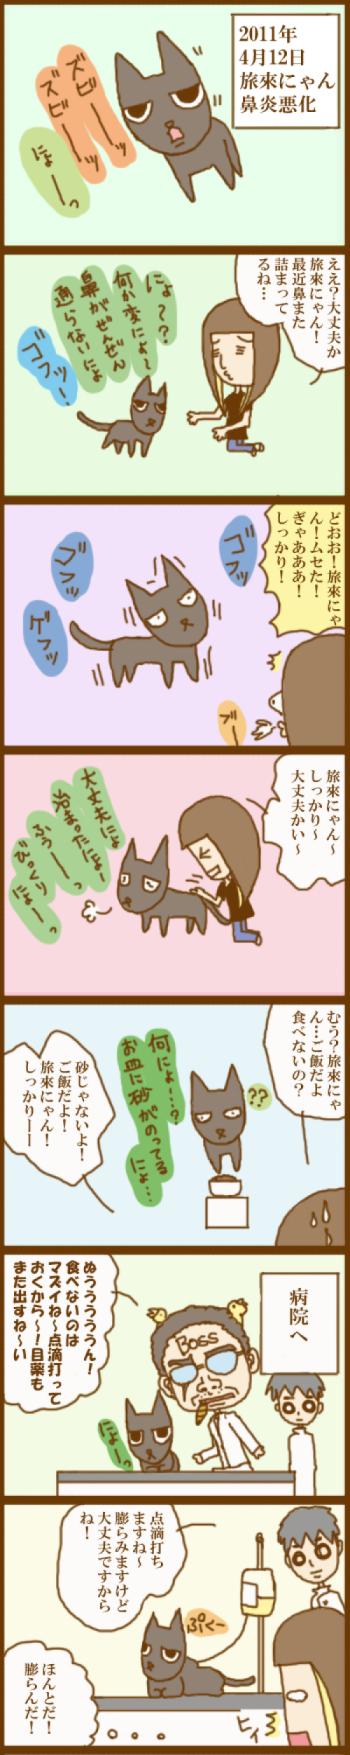 f:id:suzuokayu:20201119101608j:plain